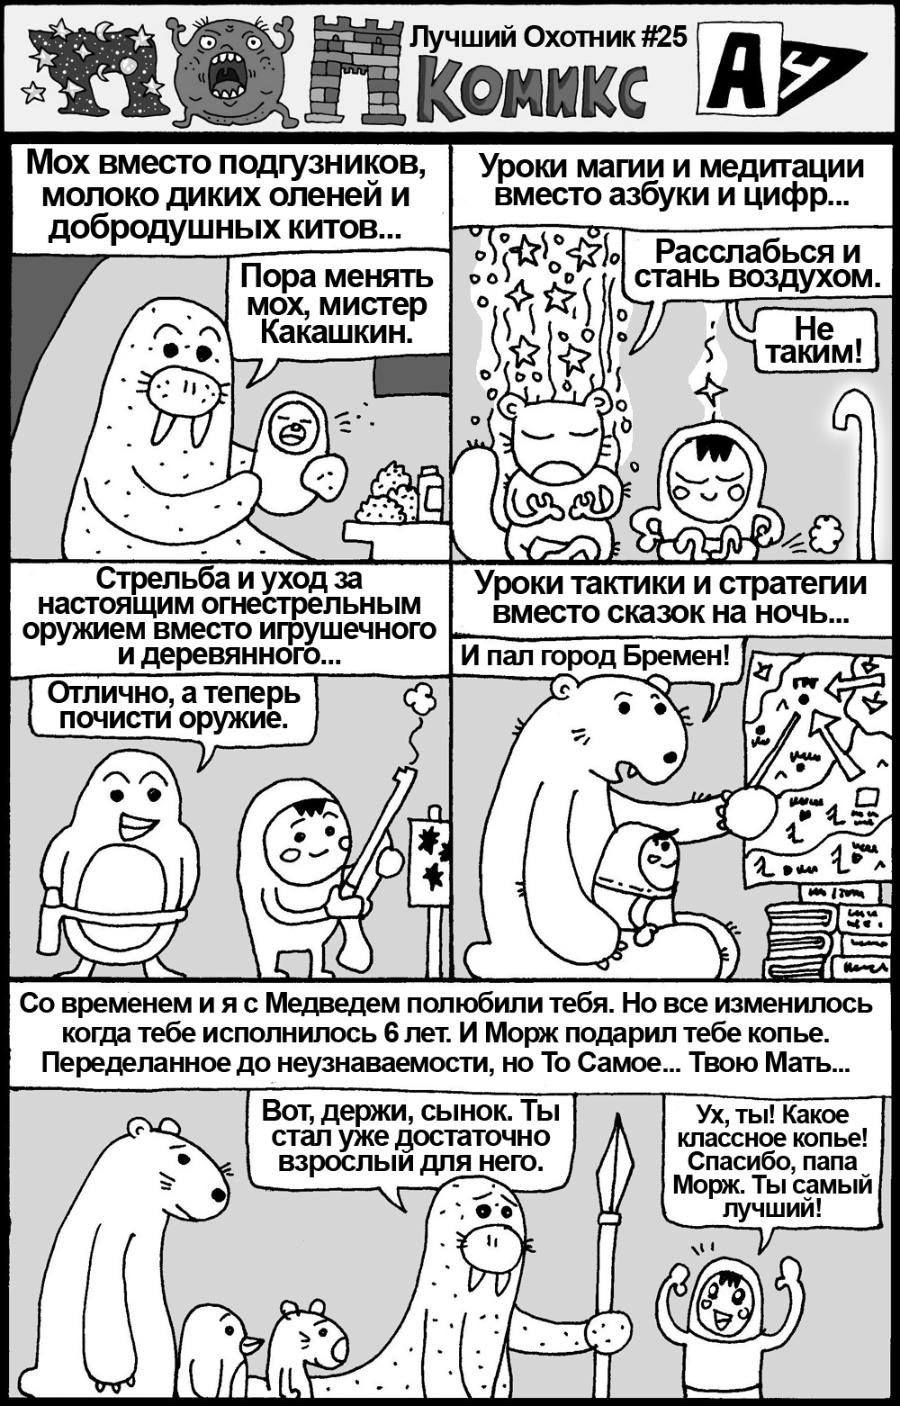 http://se.uploads.ru/35JRO.jpg